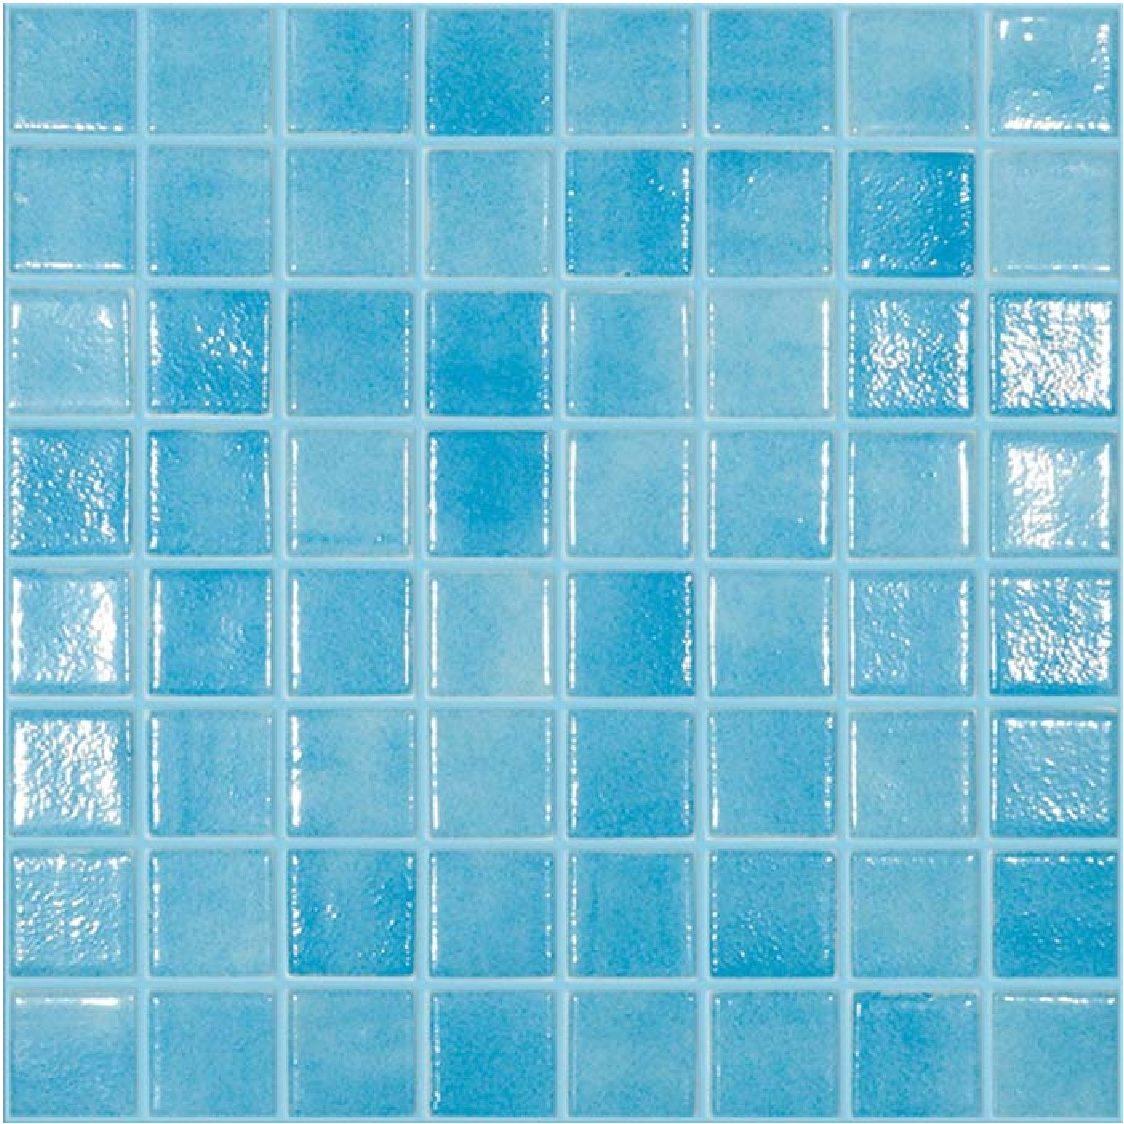 Gresite rf. 501 papier bleu